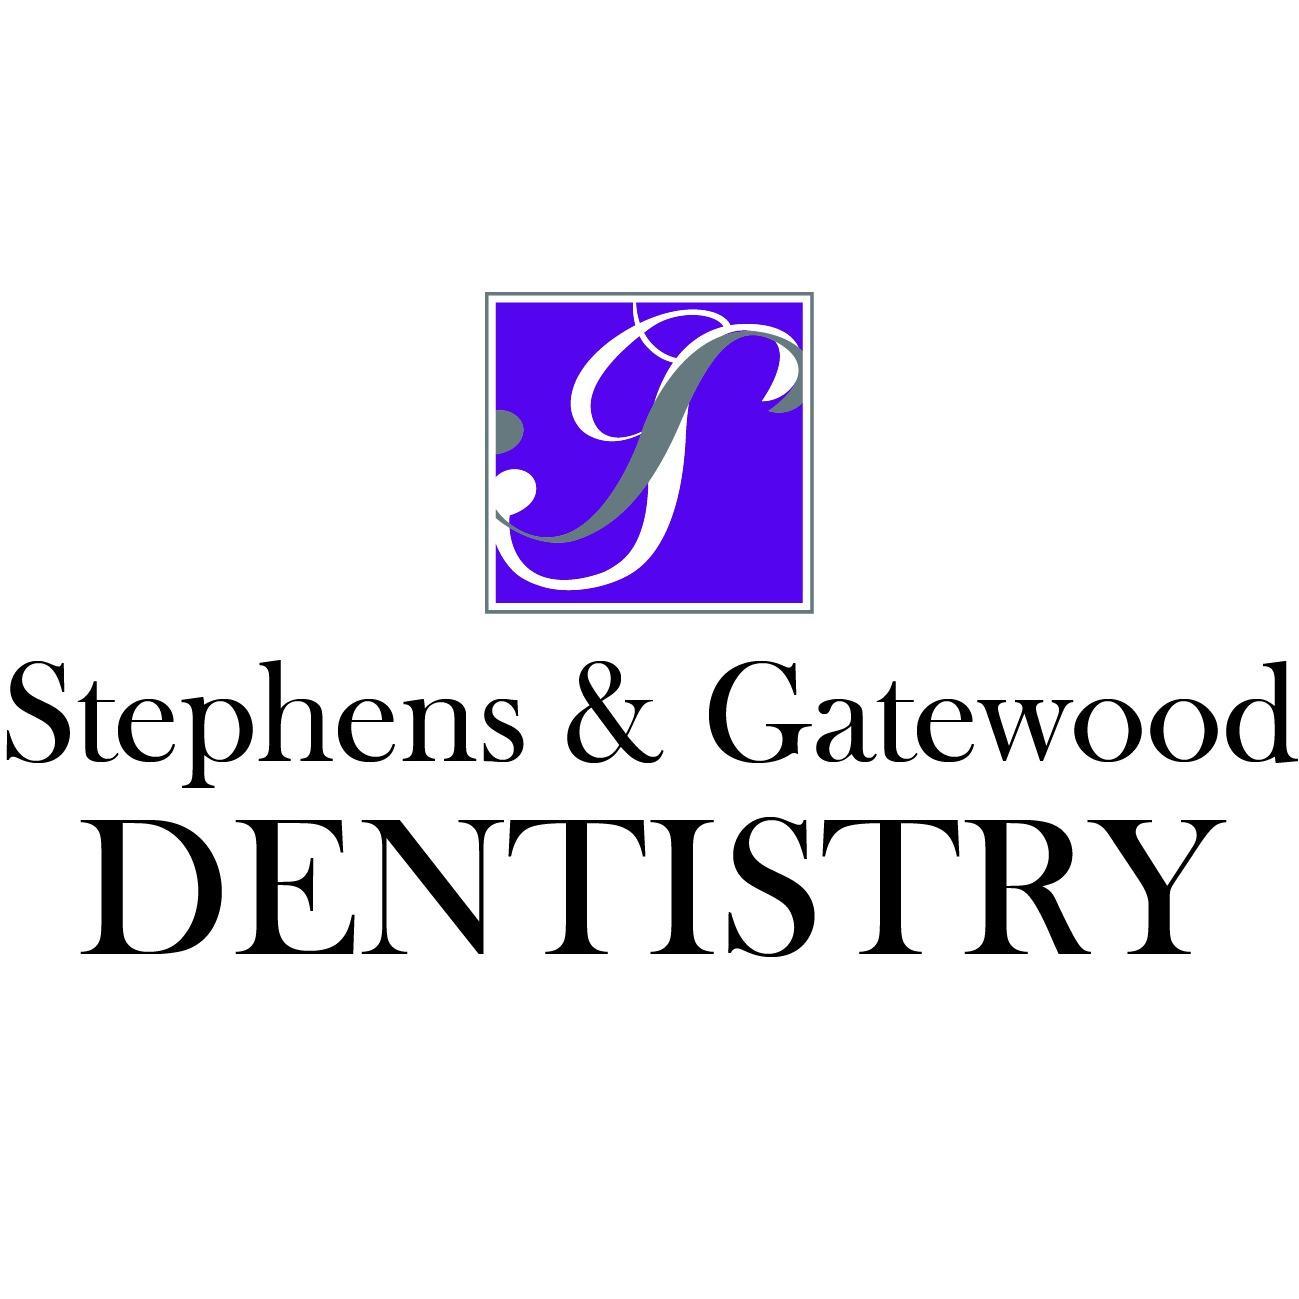 Stephens & Gatewood Dentistry - Spring, TX - Dentists & Dental Services